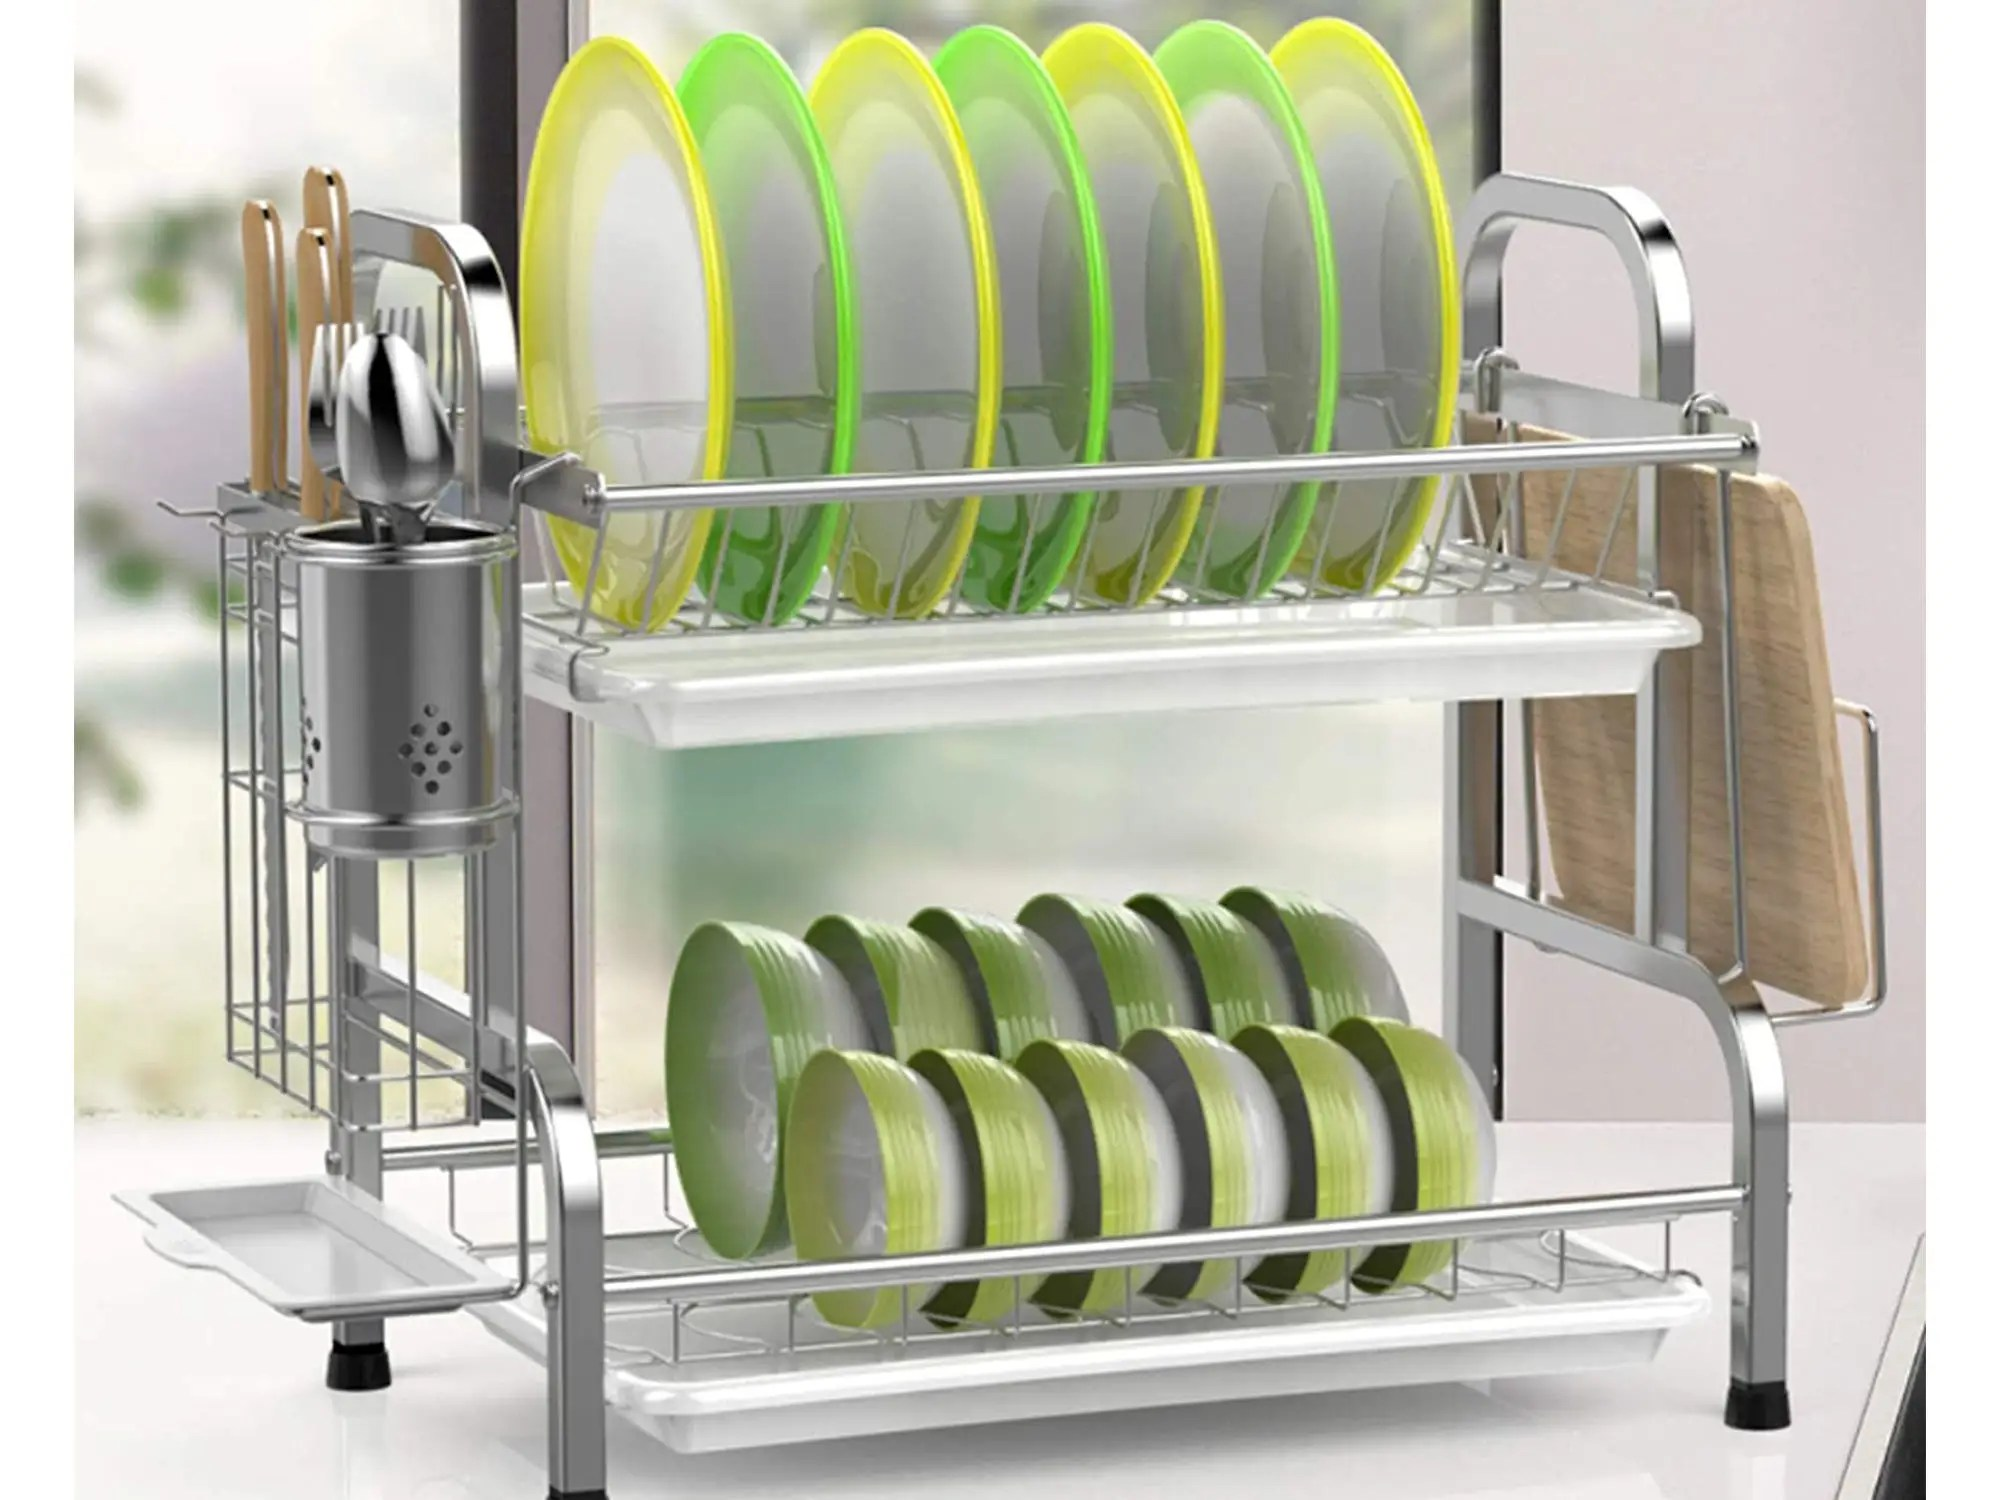 the 5 best dish drying racks of 2021